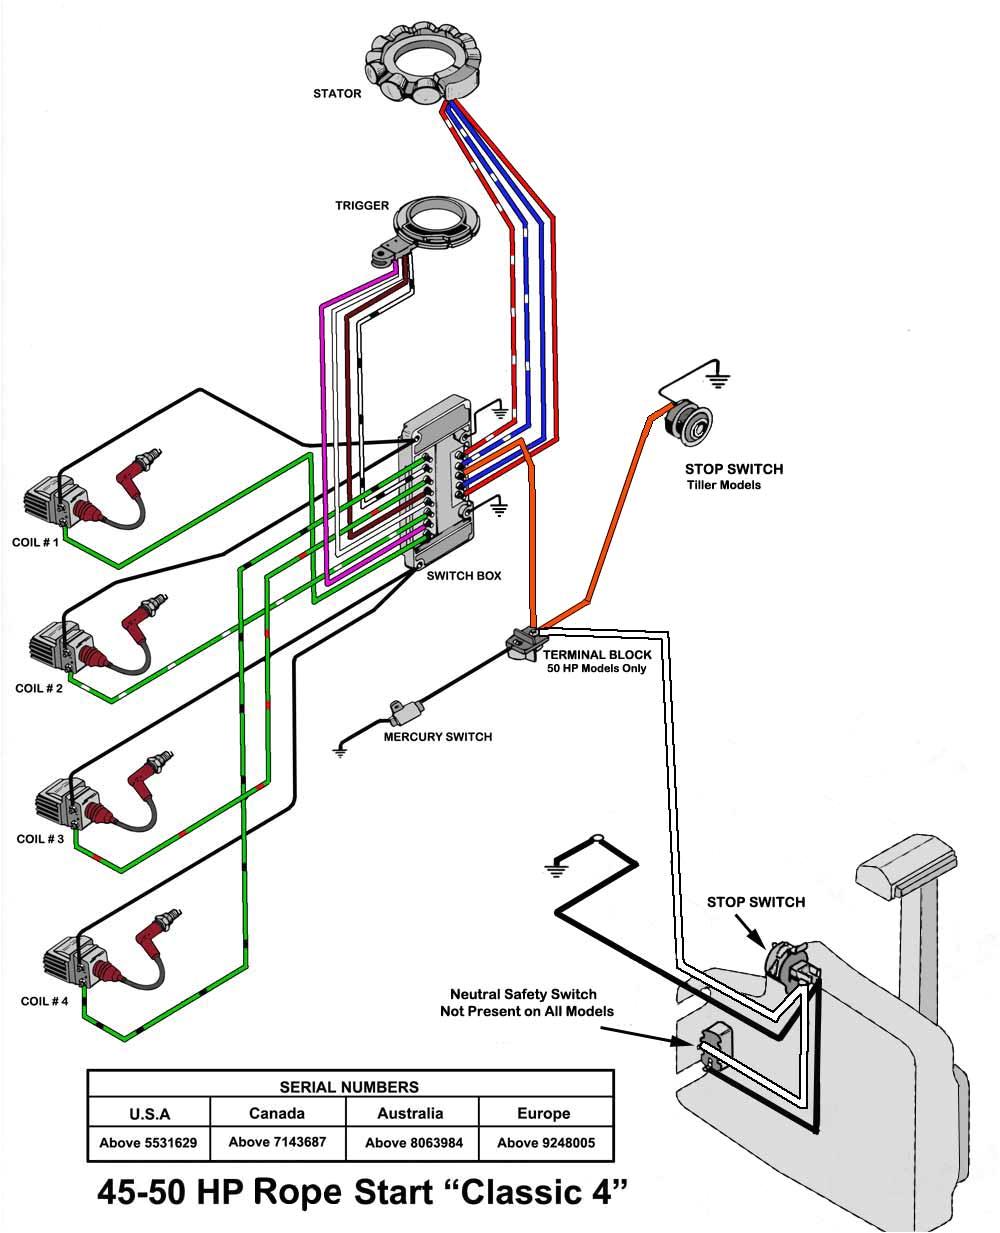 mariner magnum 40 hp wiring diagram wiring diagrams long mariner magnum 40 hp wiring diagram